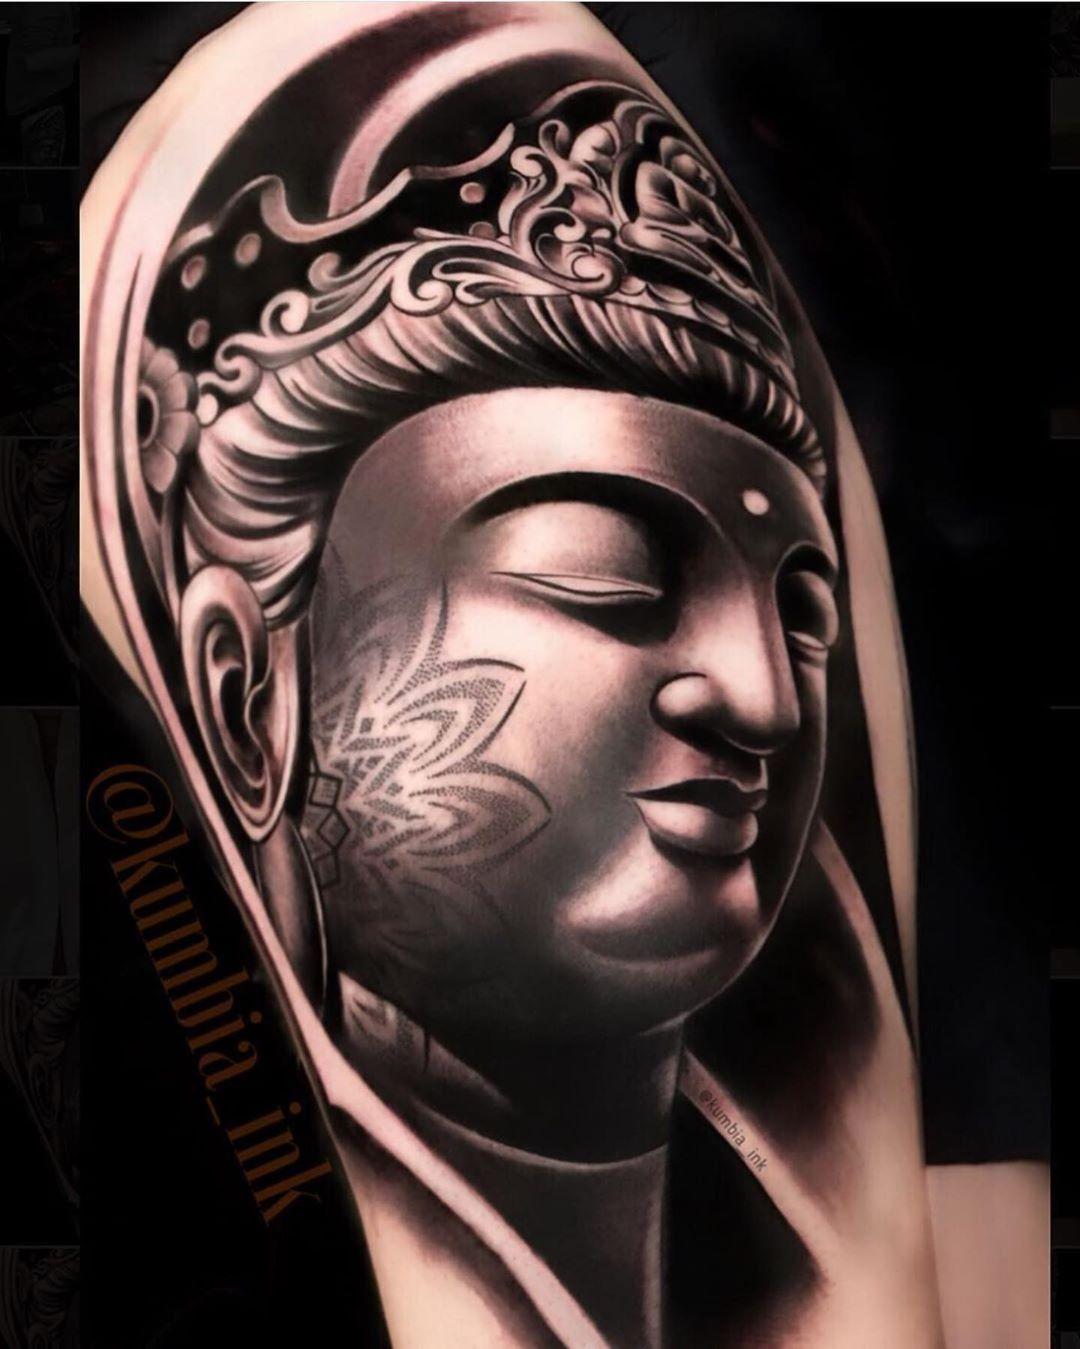 Bayarea Tattoo 9dragonsink On Instagram Buddha Kumbia Ink Portrait Tattoo Sleeve Black And Grey Sleeve Tattoos